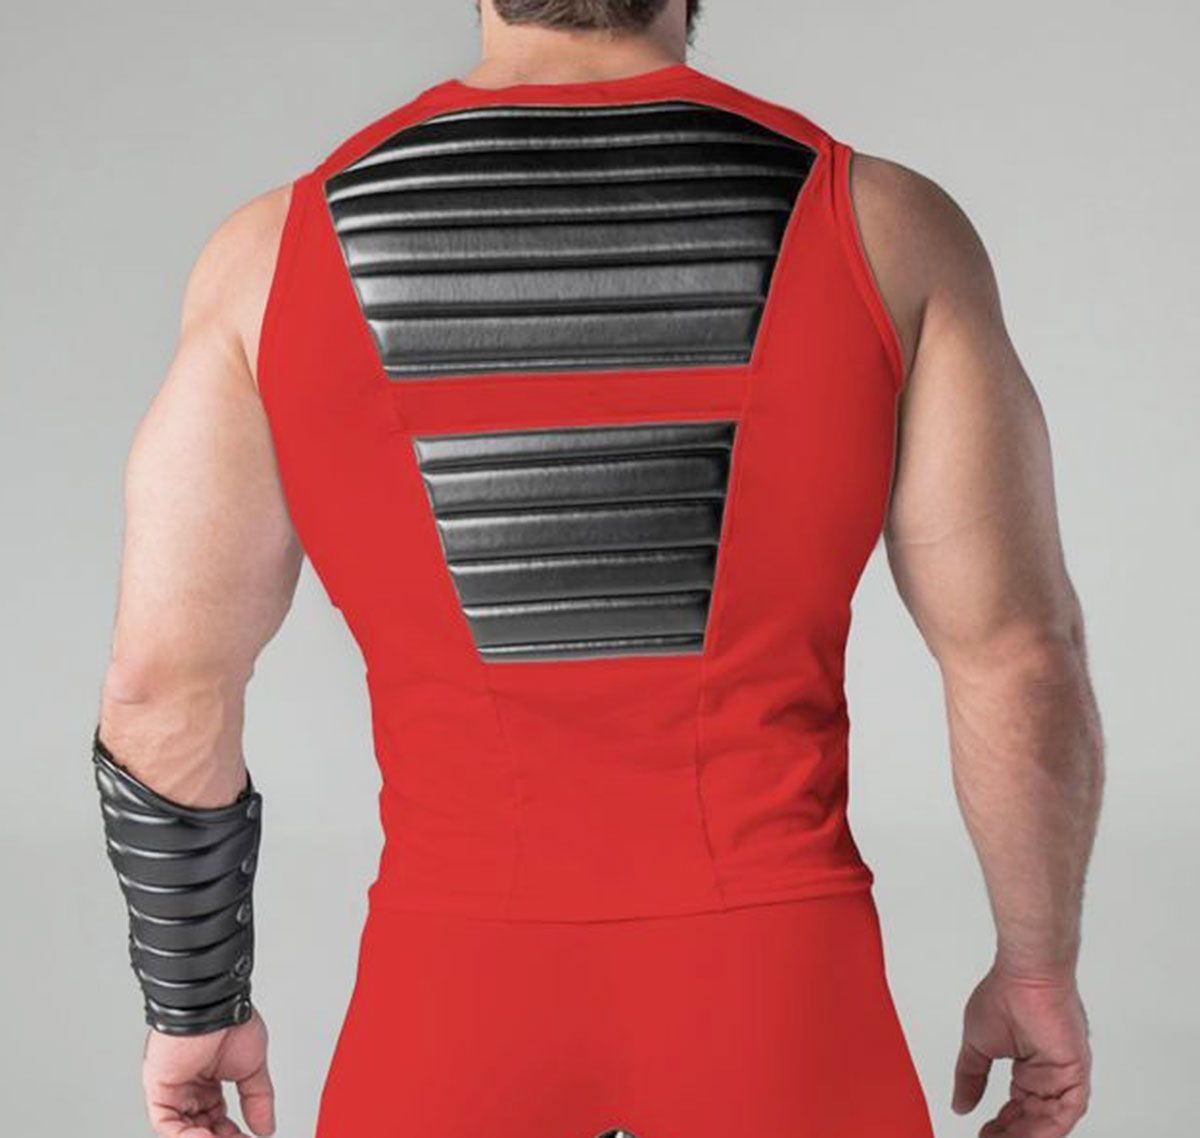 MASKULO Camiseta de tirantes fetiche ARMORED. TP060, rojo